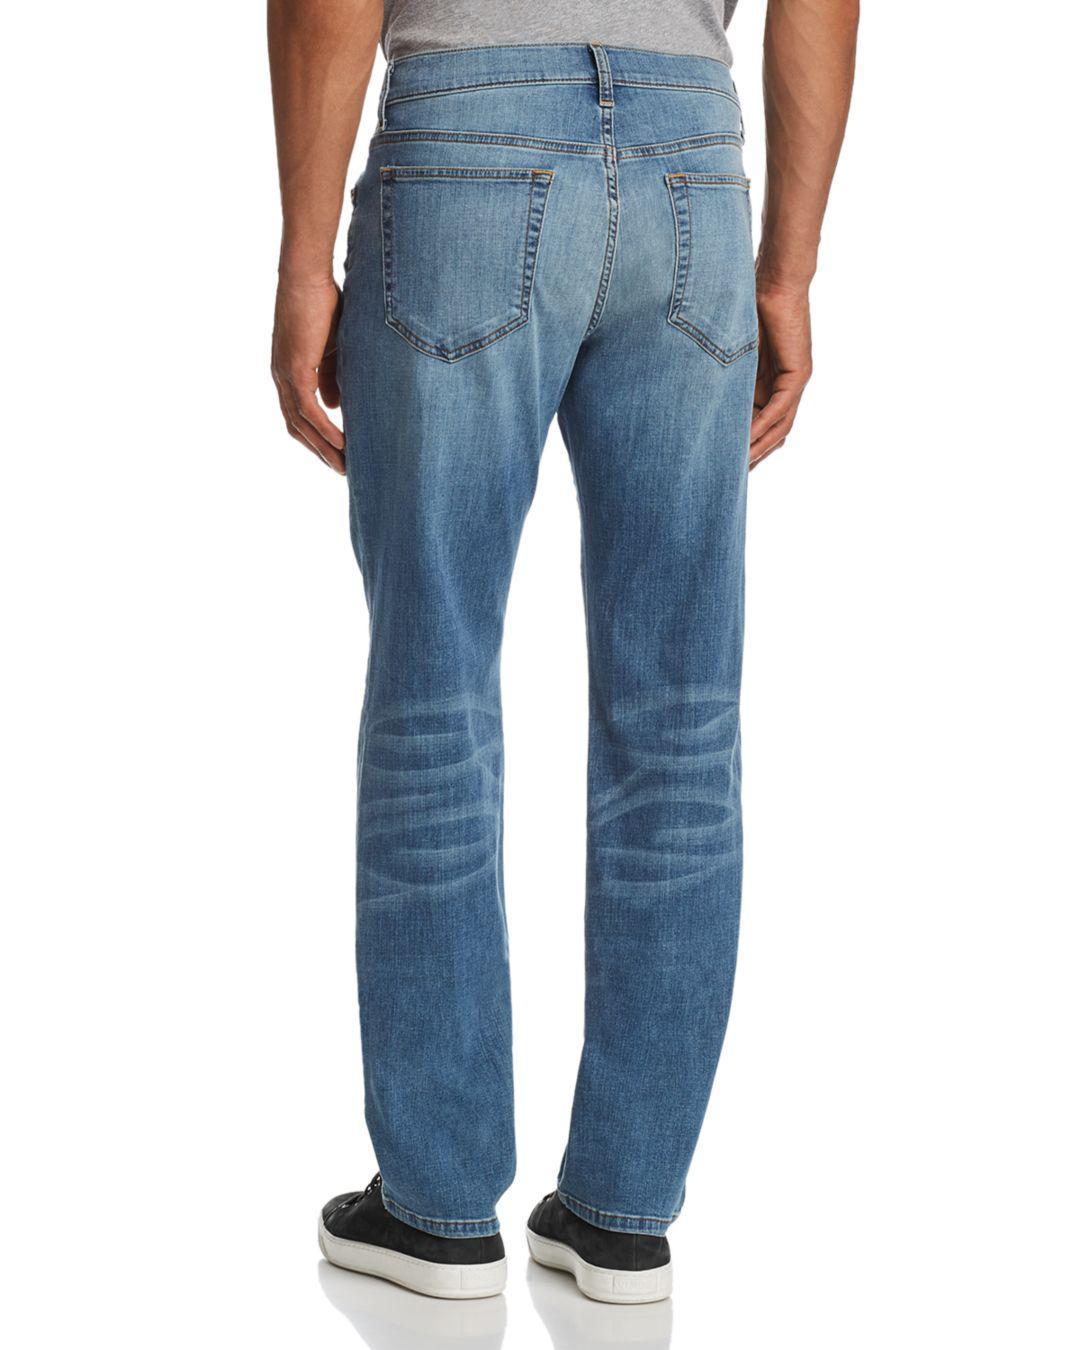 Joe's Jeans Denim Brixton Slim Straight Fit Jeans In Redding in Blue for Men